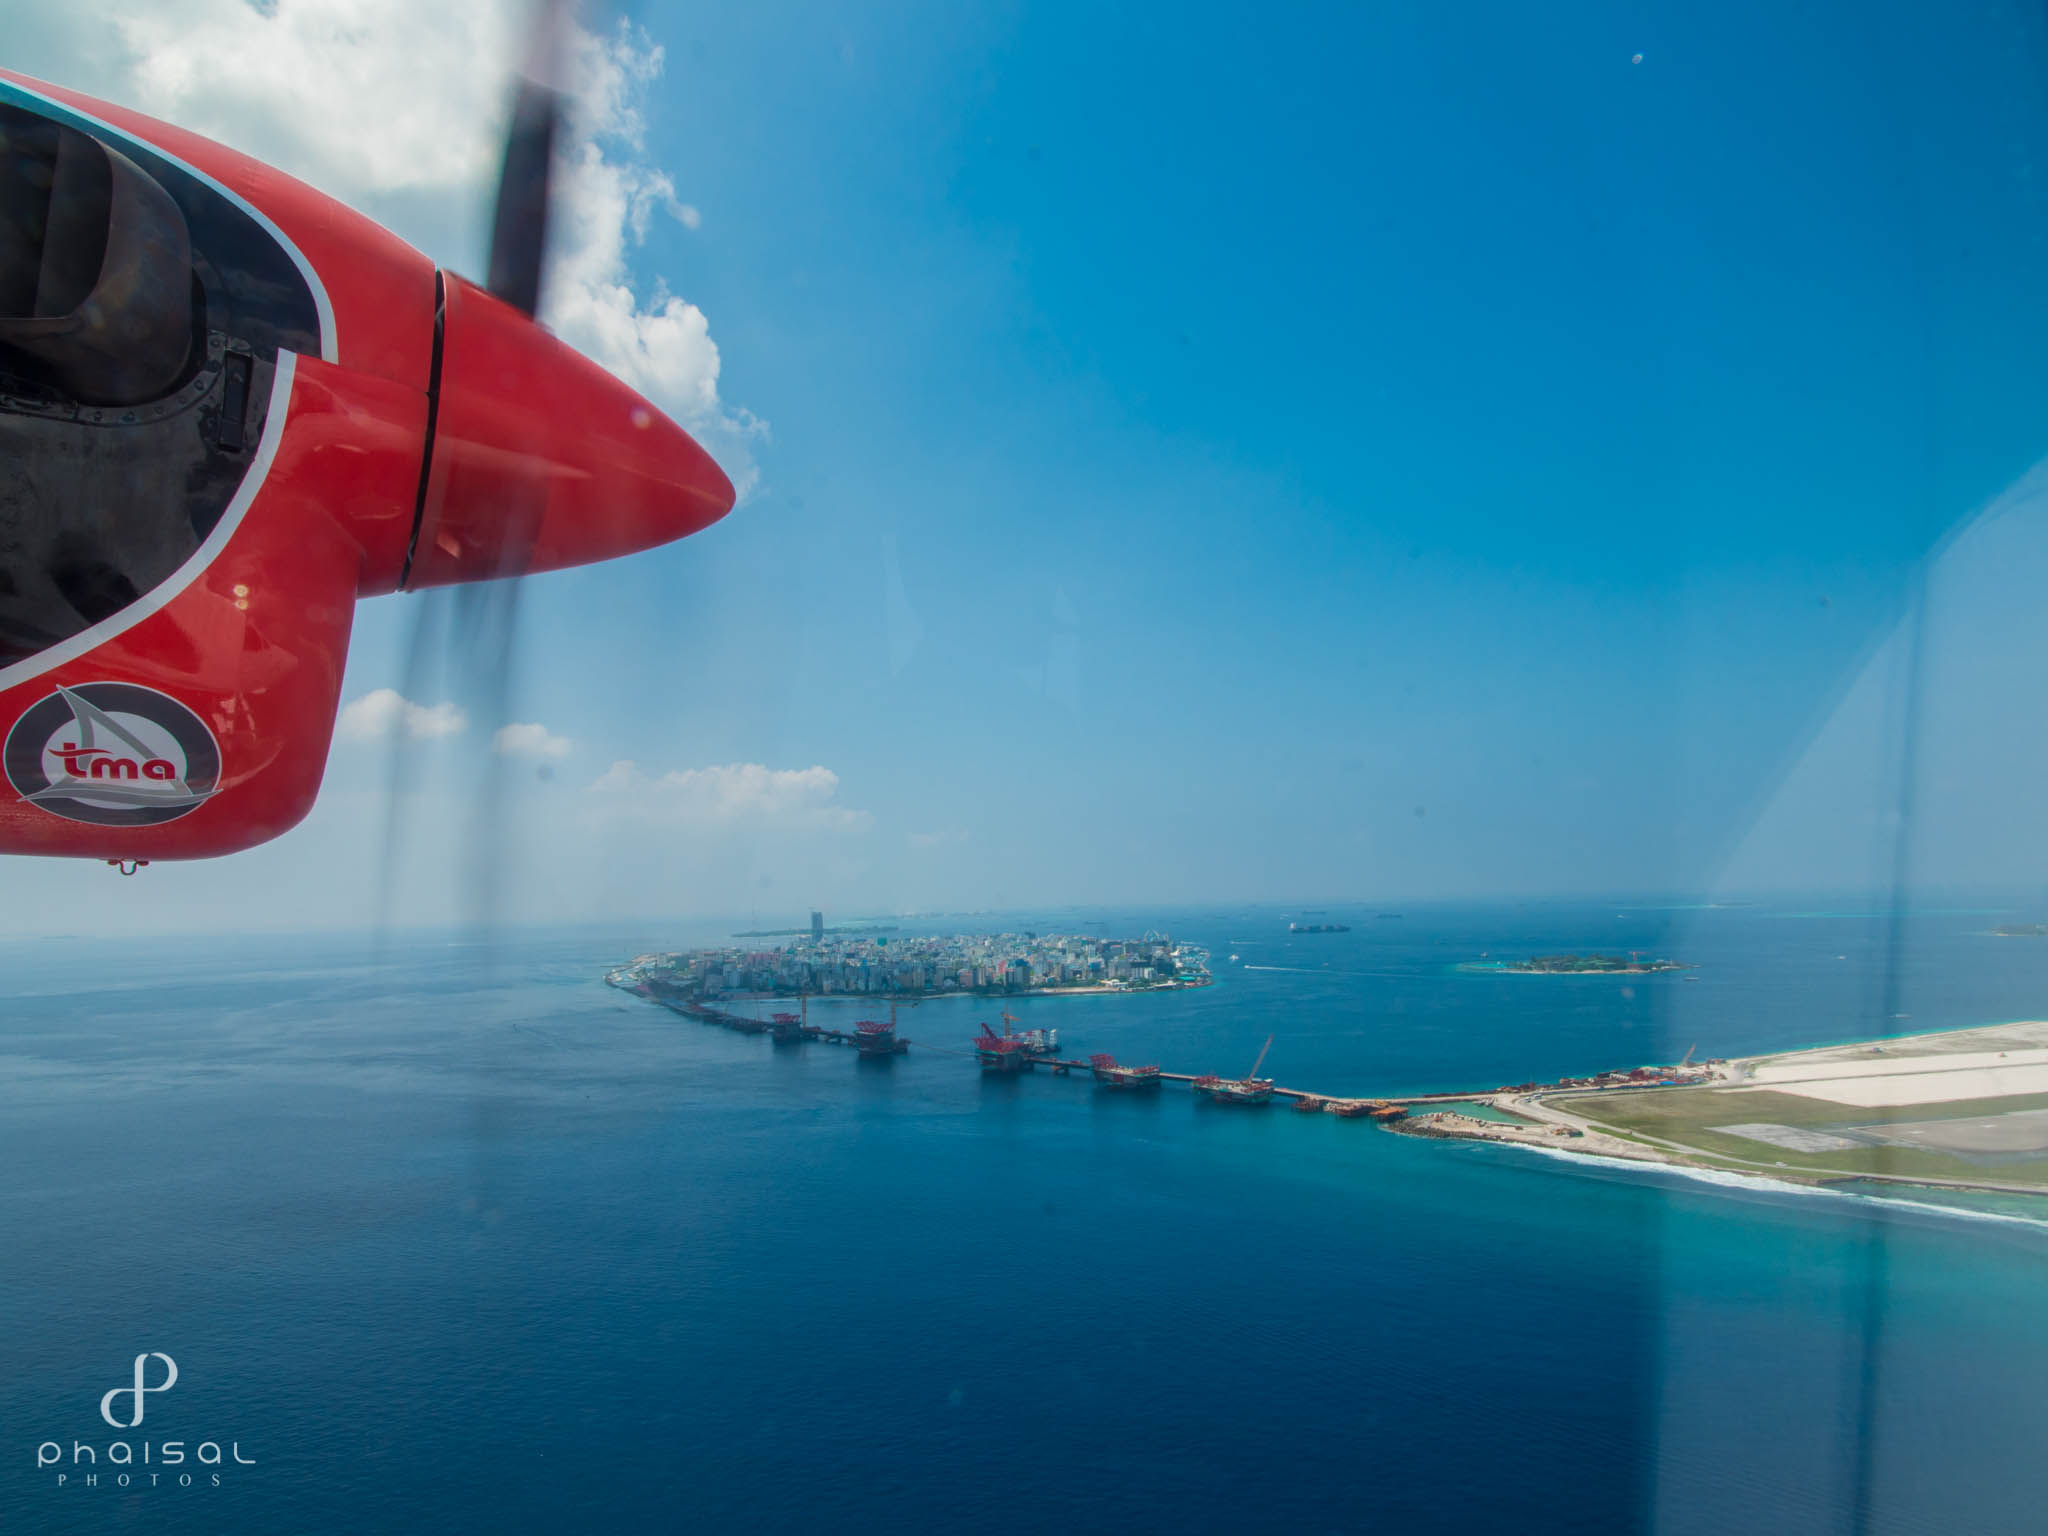 capital city of the Maldives